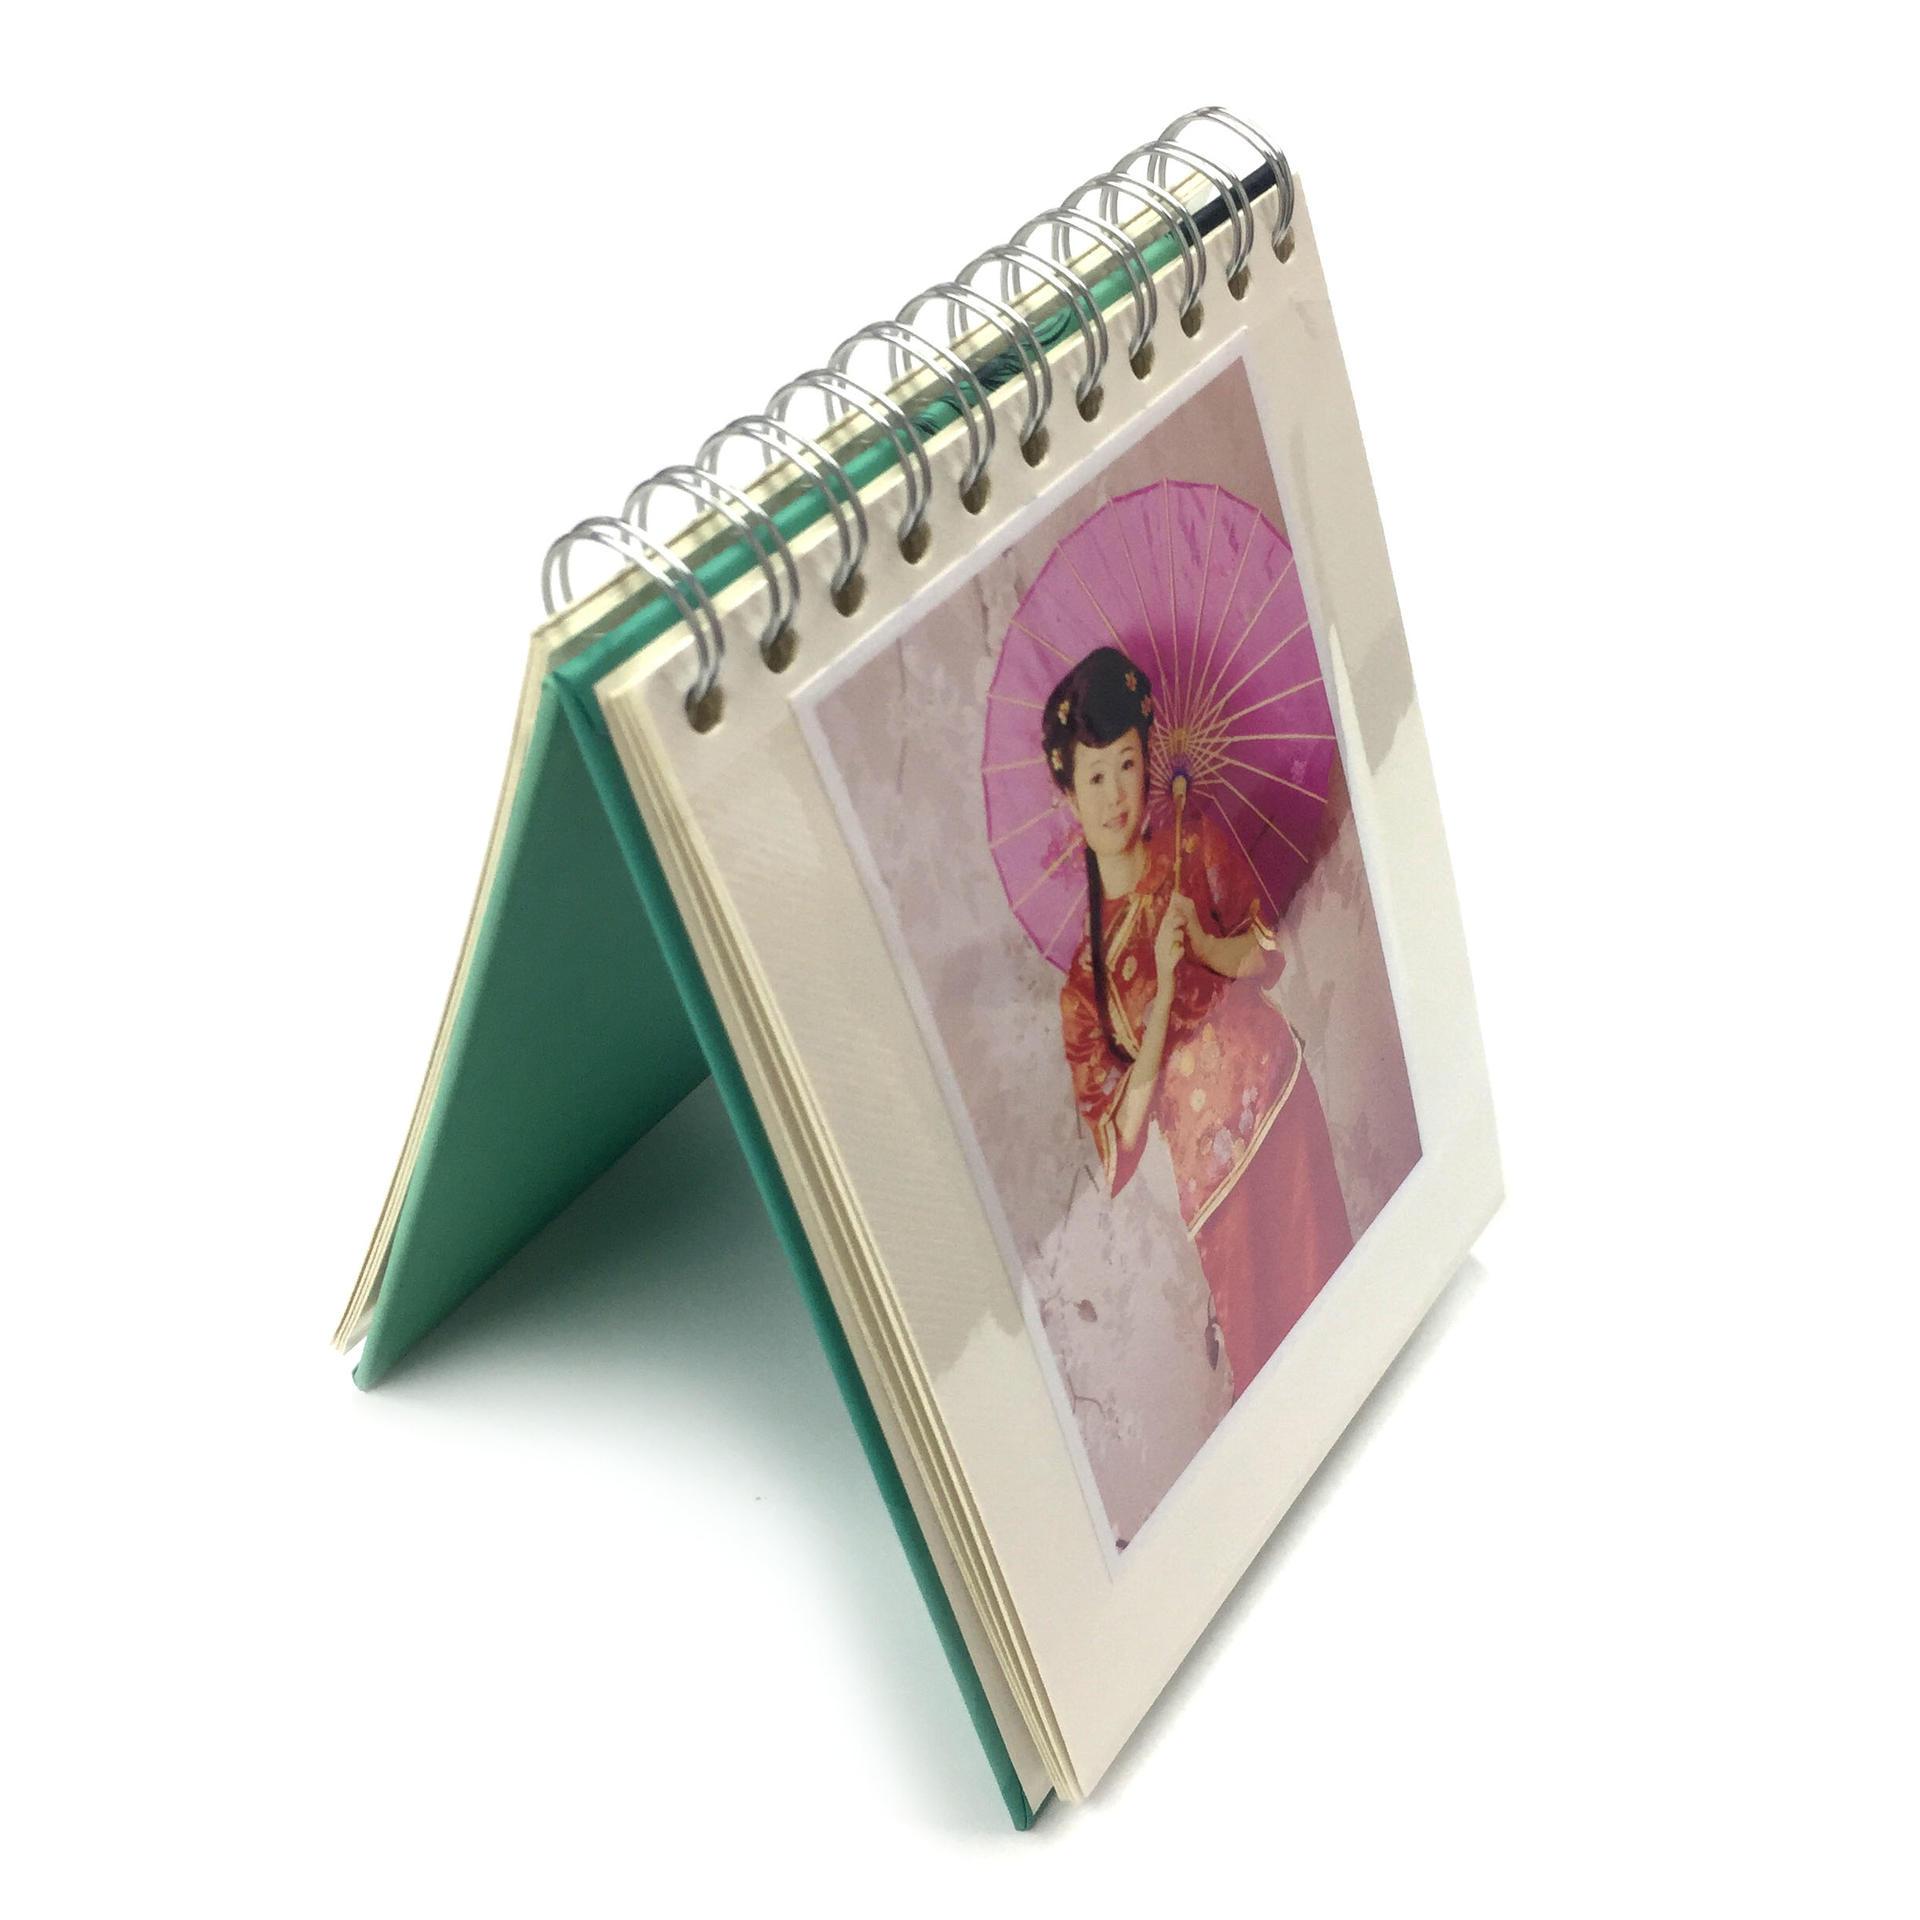 product-Dezheng-Beautiful Flamingo Spiral binding 10 sheets Self Stick Photo Album Scrapbook-img-1